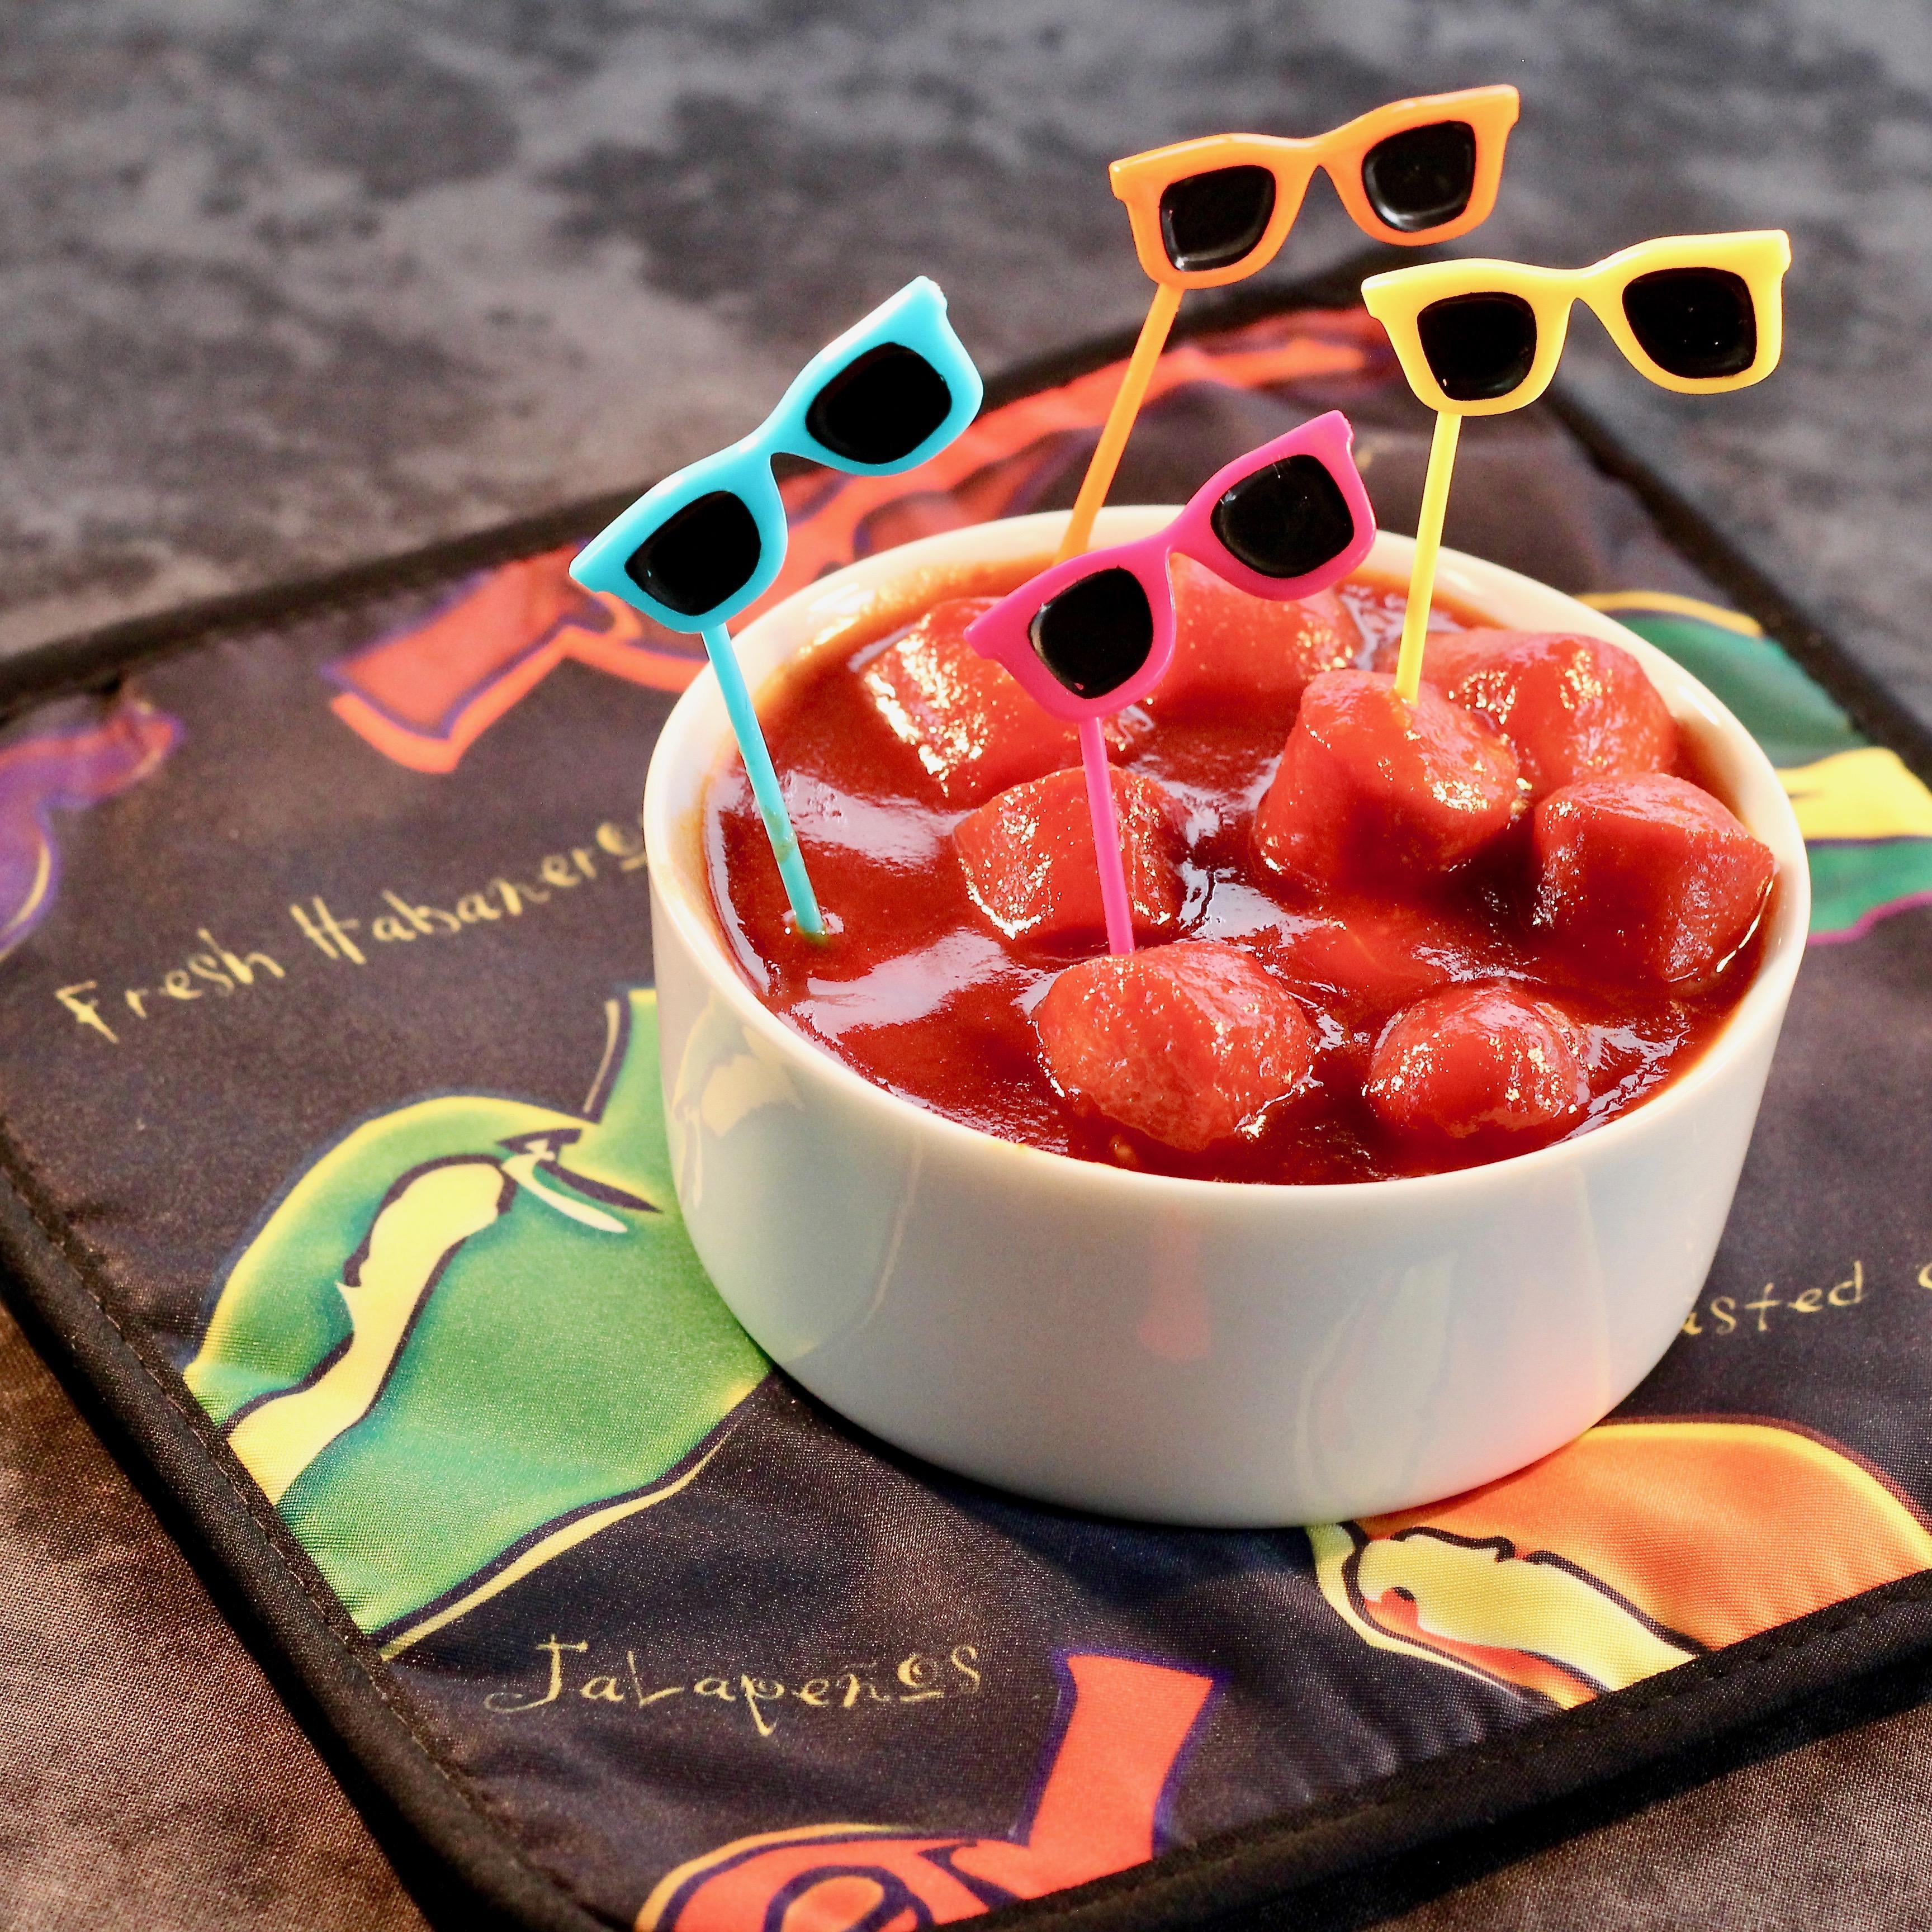 Saucy Sriracha Franks